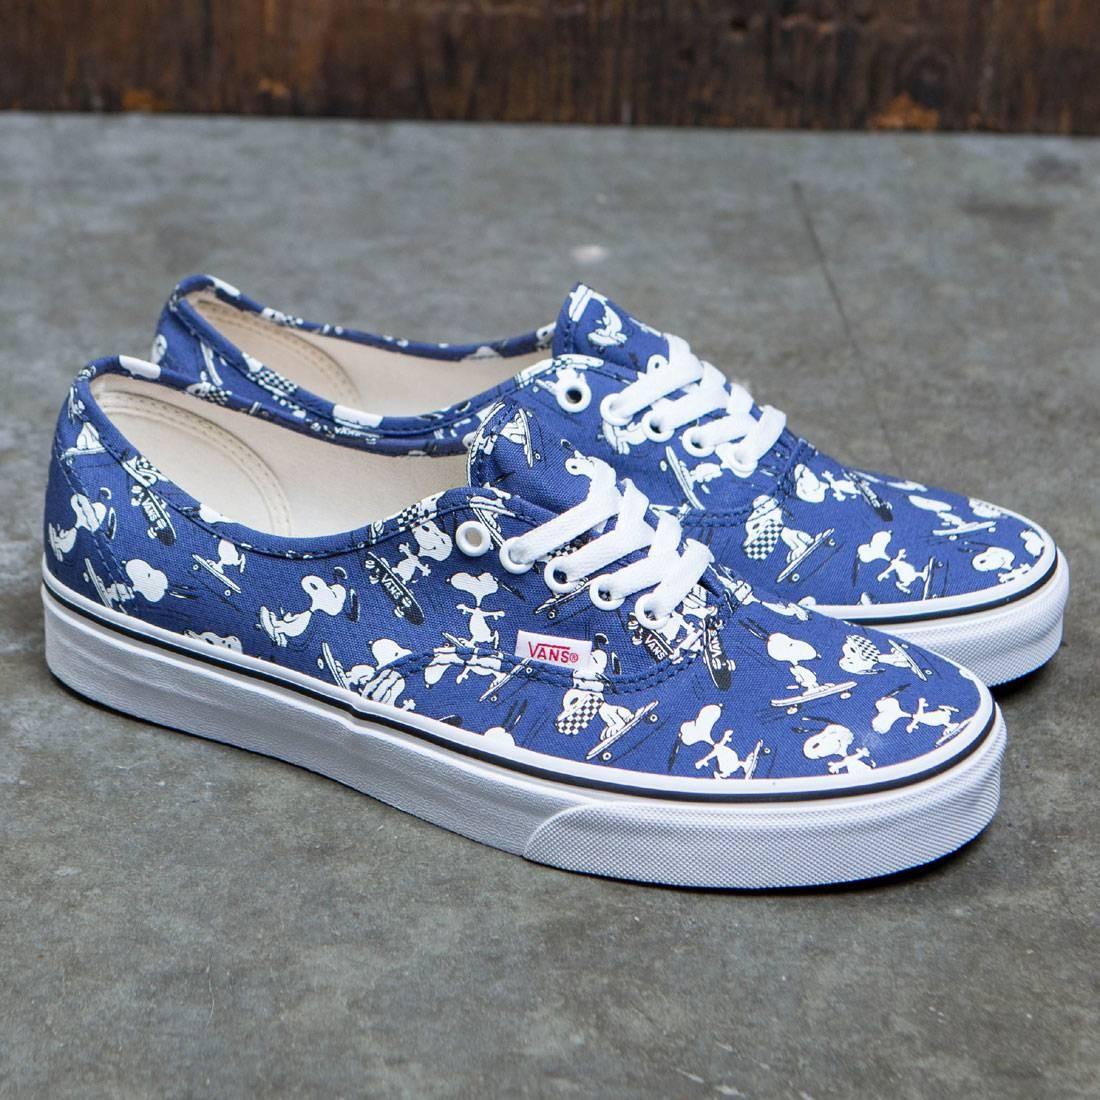 e5af68c2ac Vans x Peanuts Men Authentic - Snoopy Skating (blue)